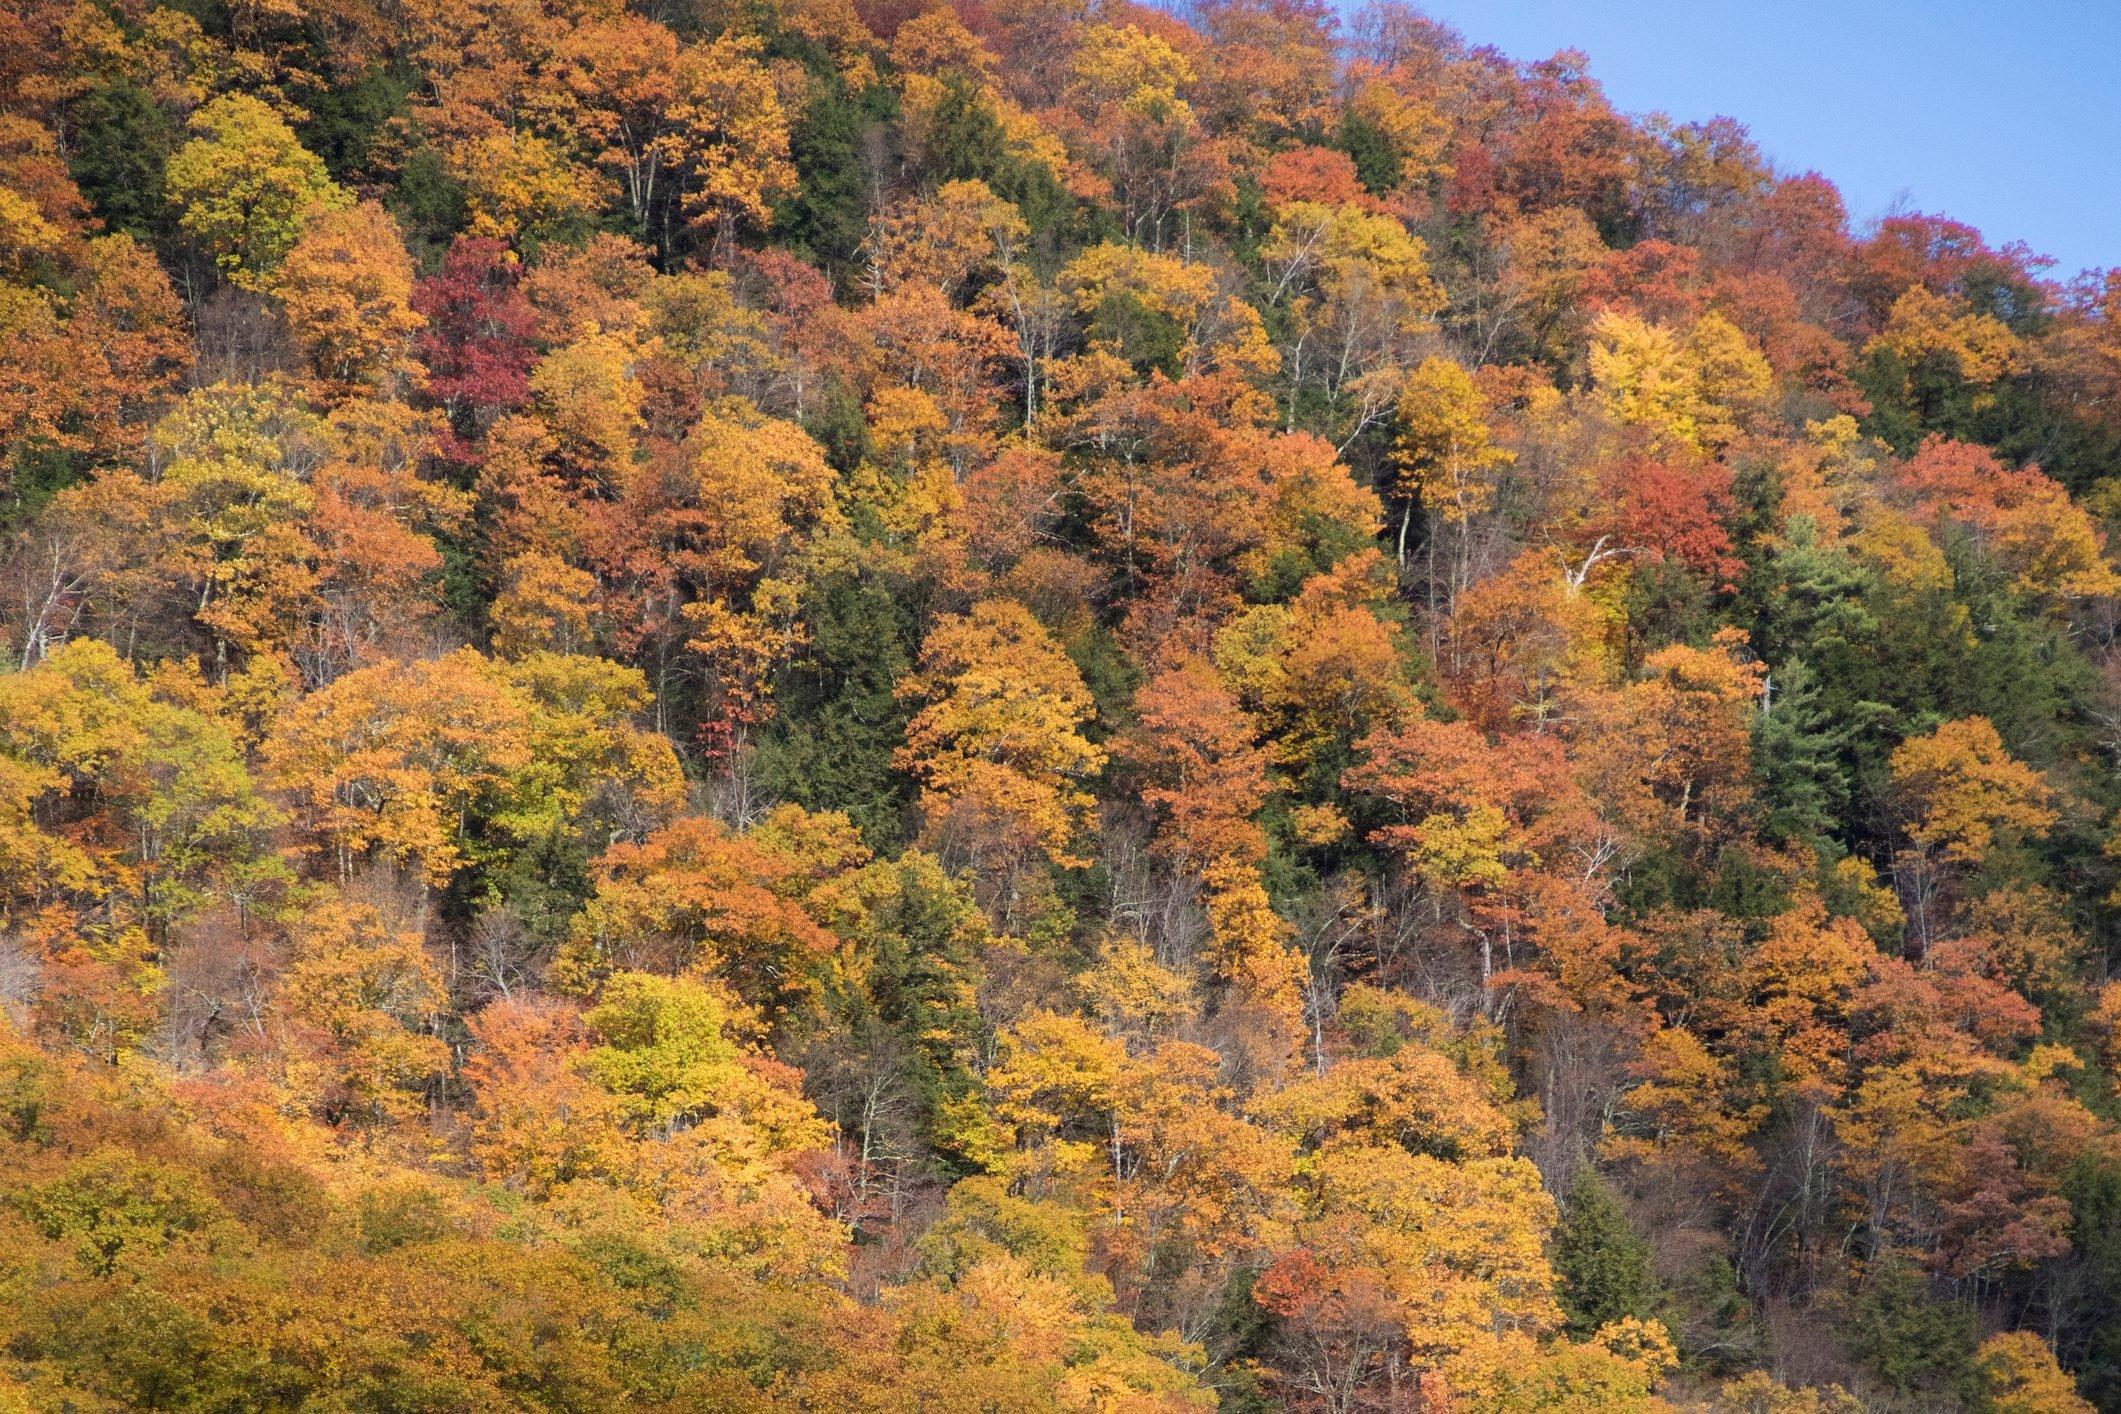 Autumn leaf color along the Mohawk Trail